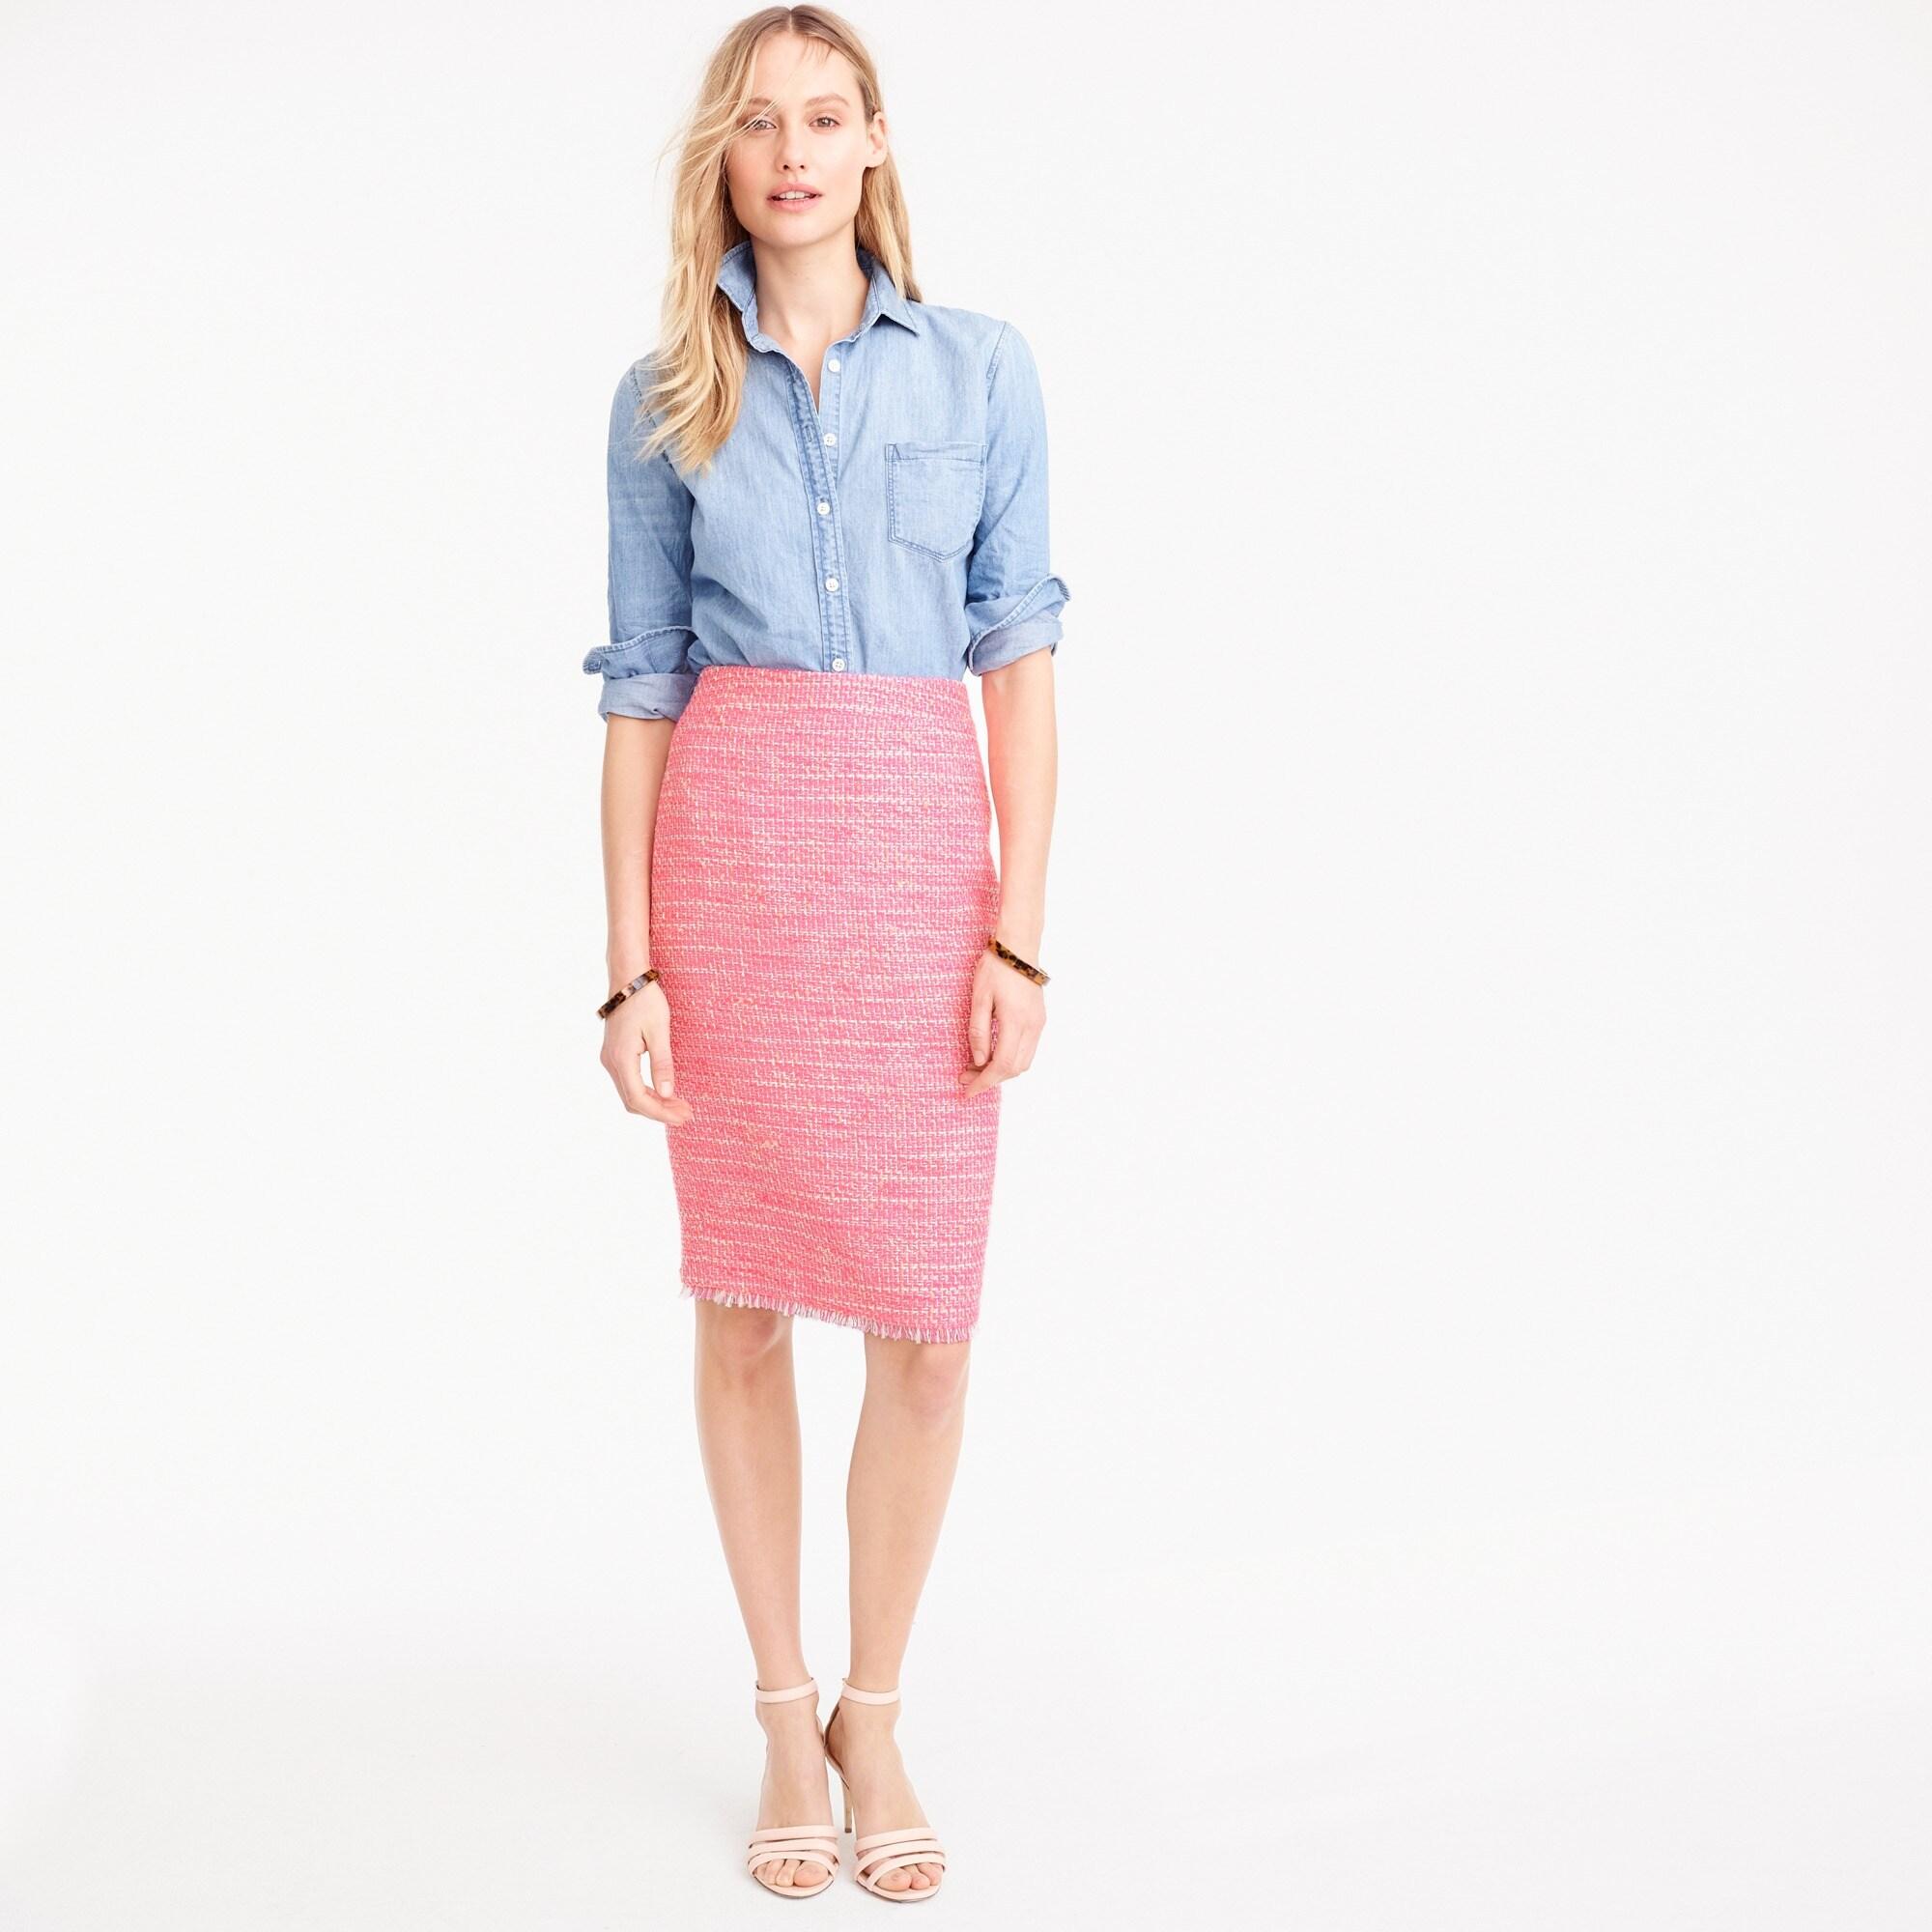 pencil skirt in neon fuchsia tweed : women skirts